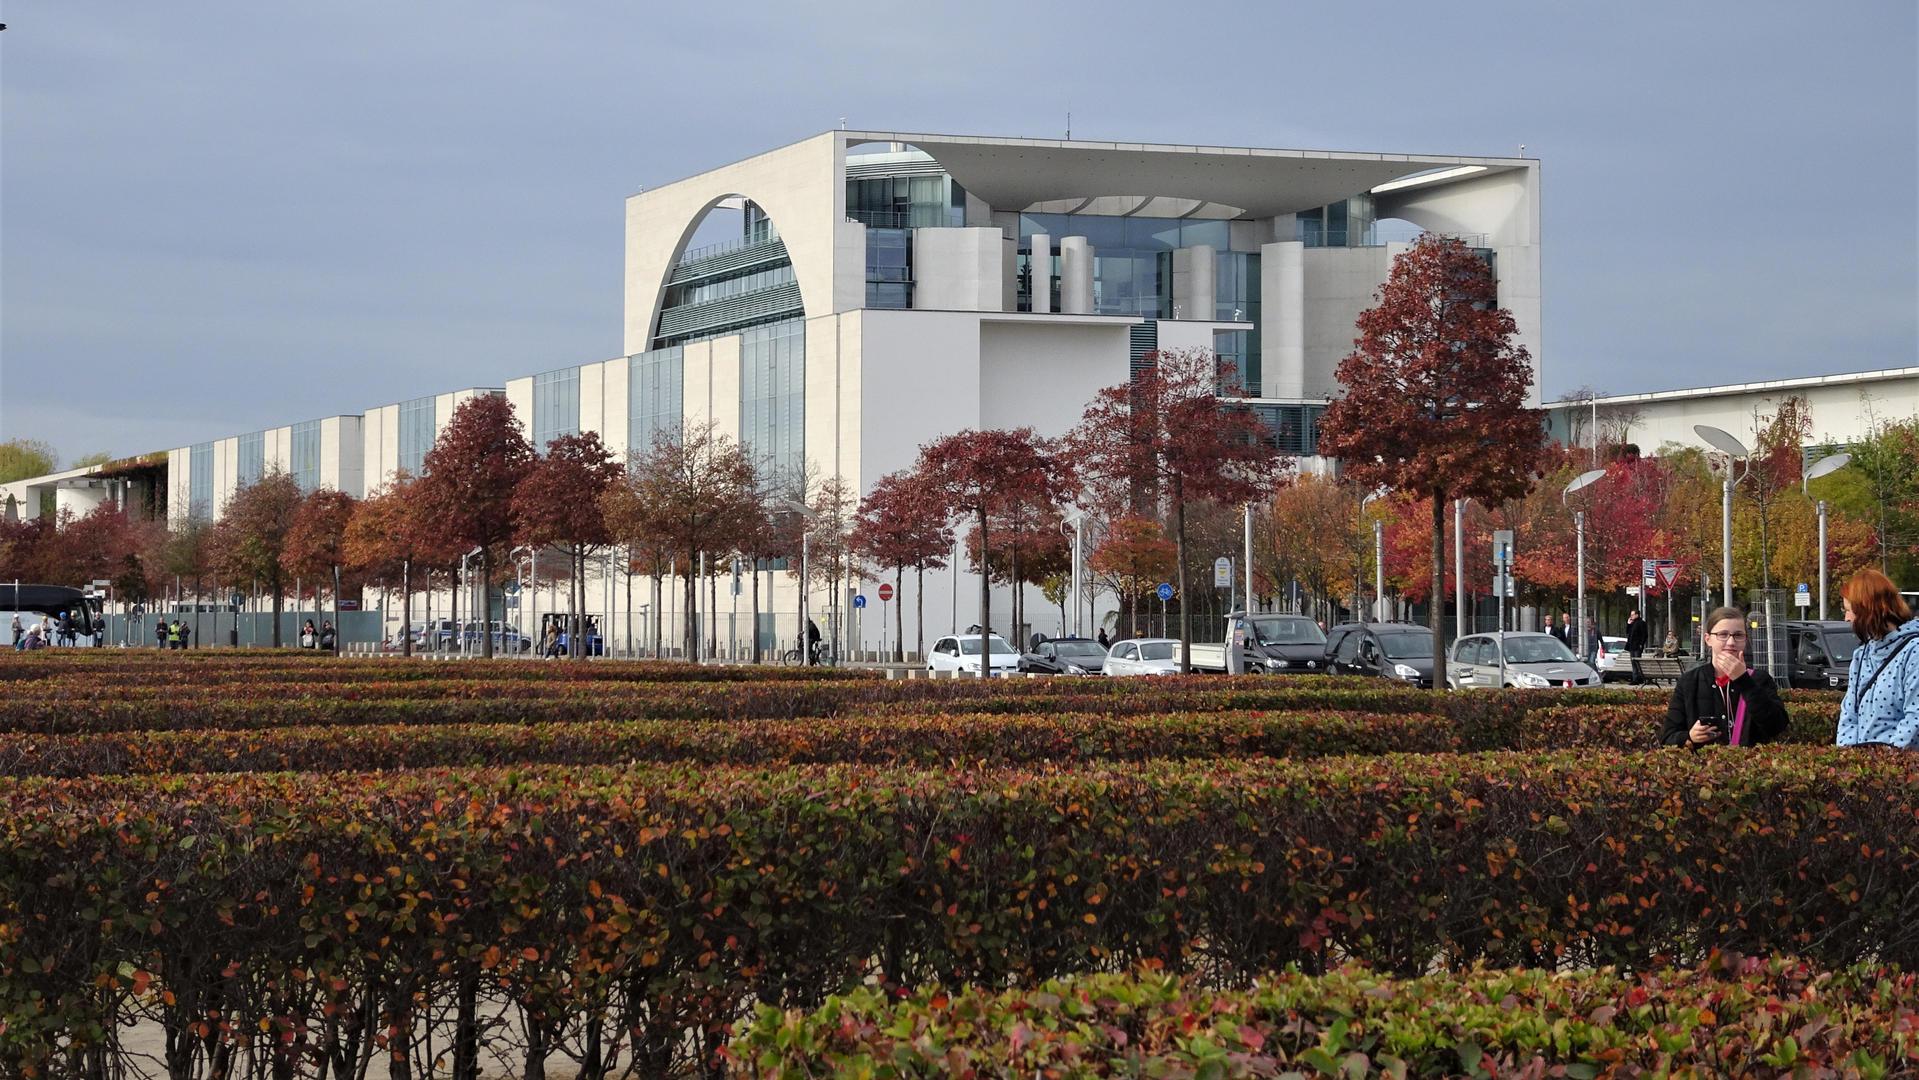 Bundeskanzleramt. Berlin, Alemania.